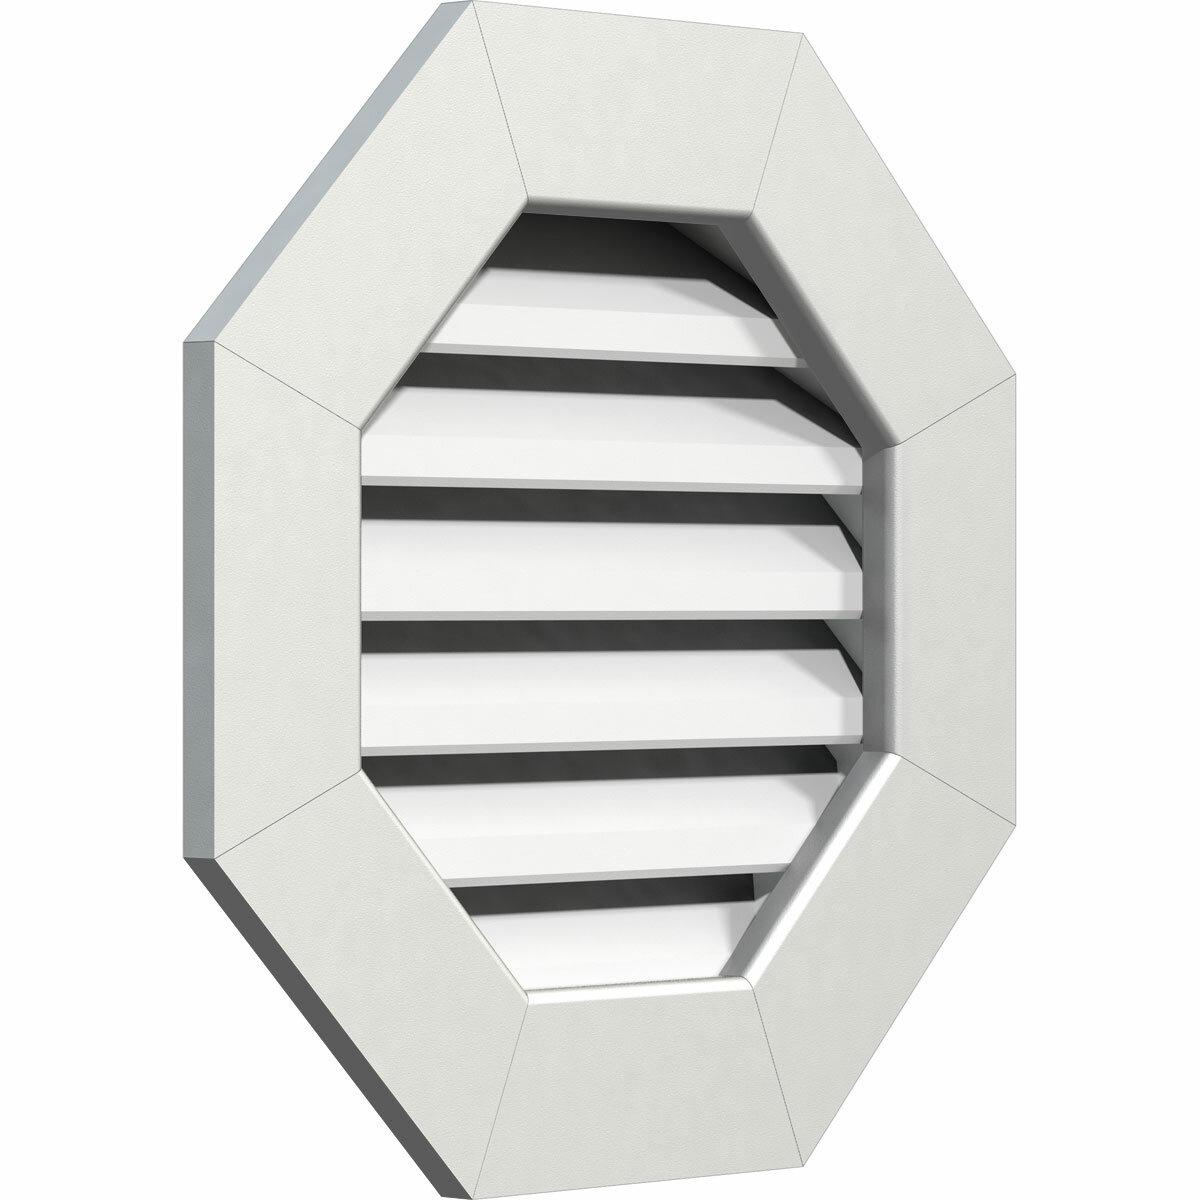 Ekena Millwork Pvc Octagonal Gable Vent With Flat Trim Frame In White Wayfair